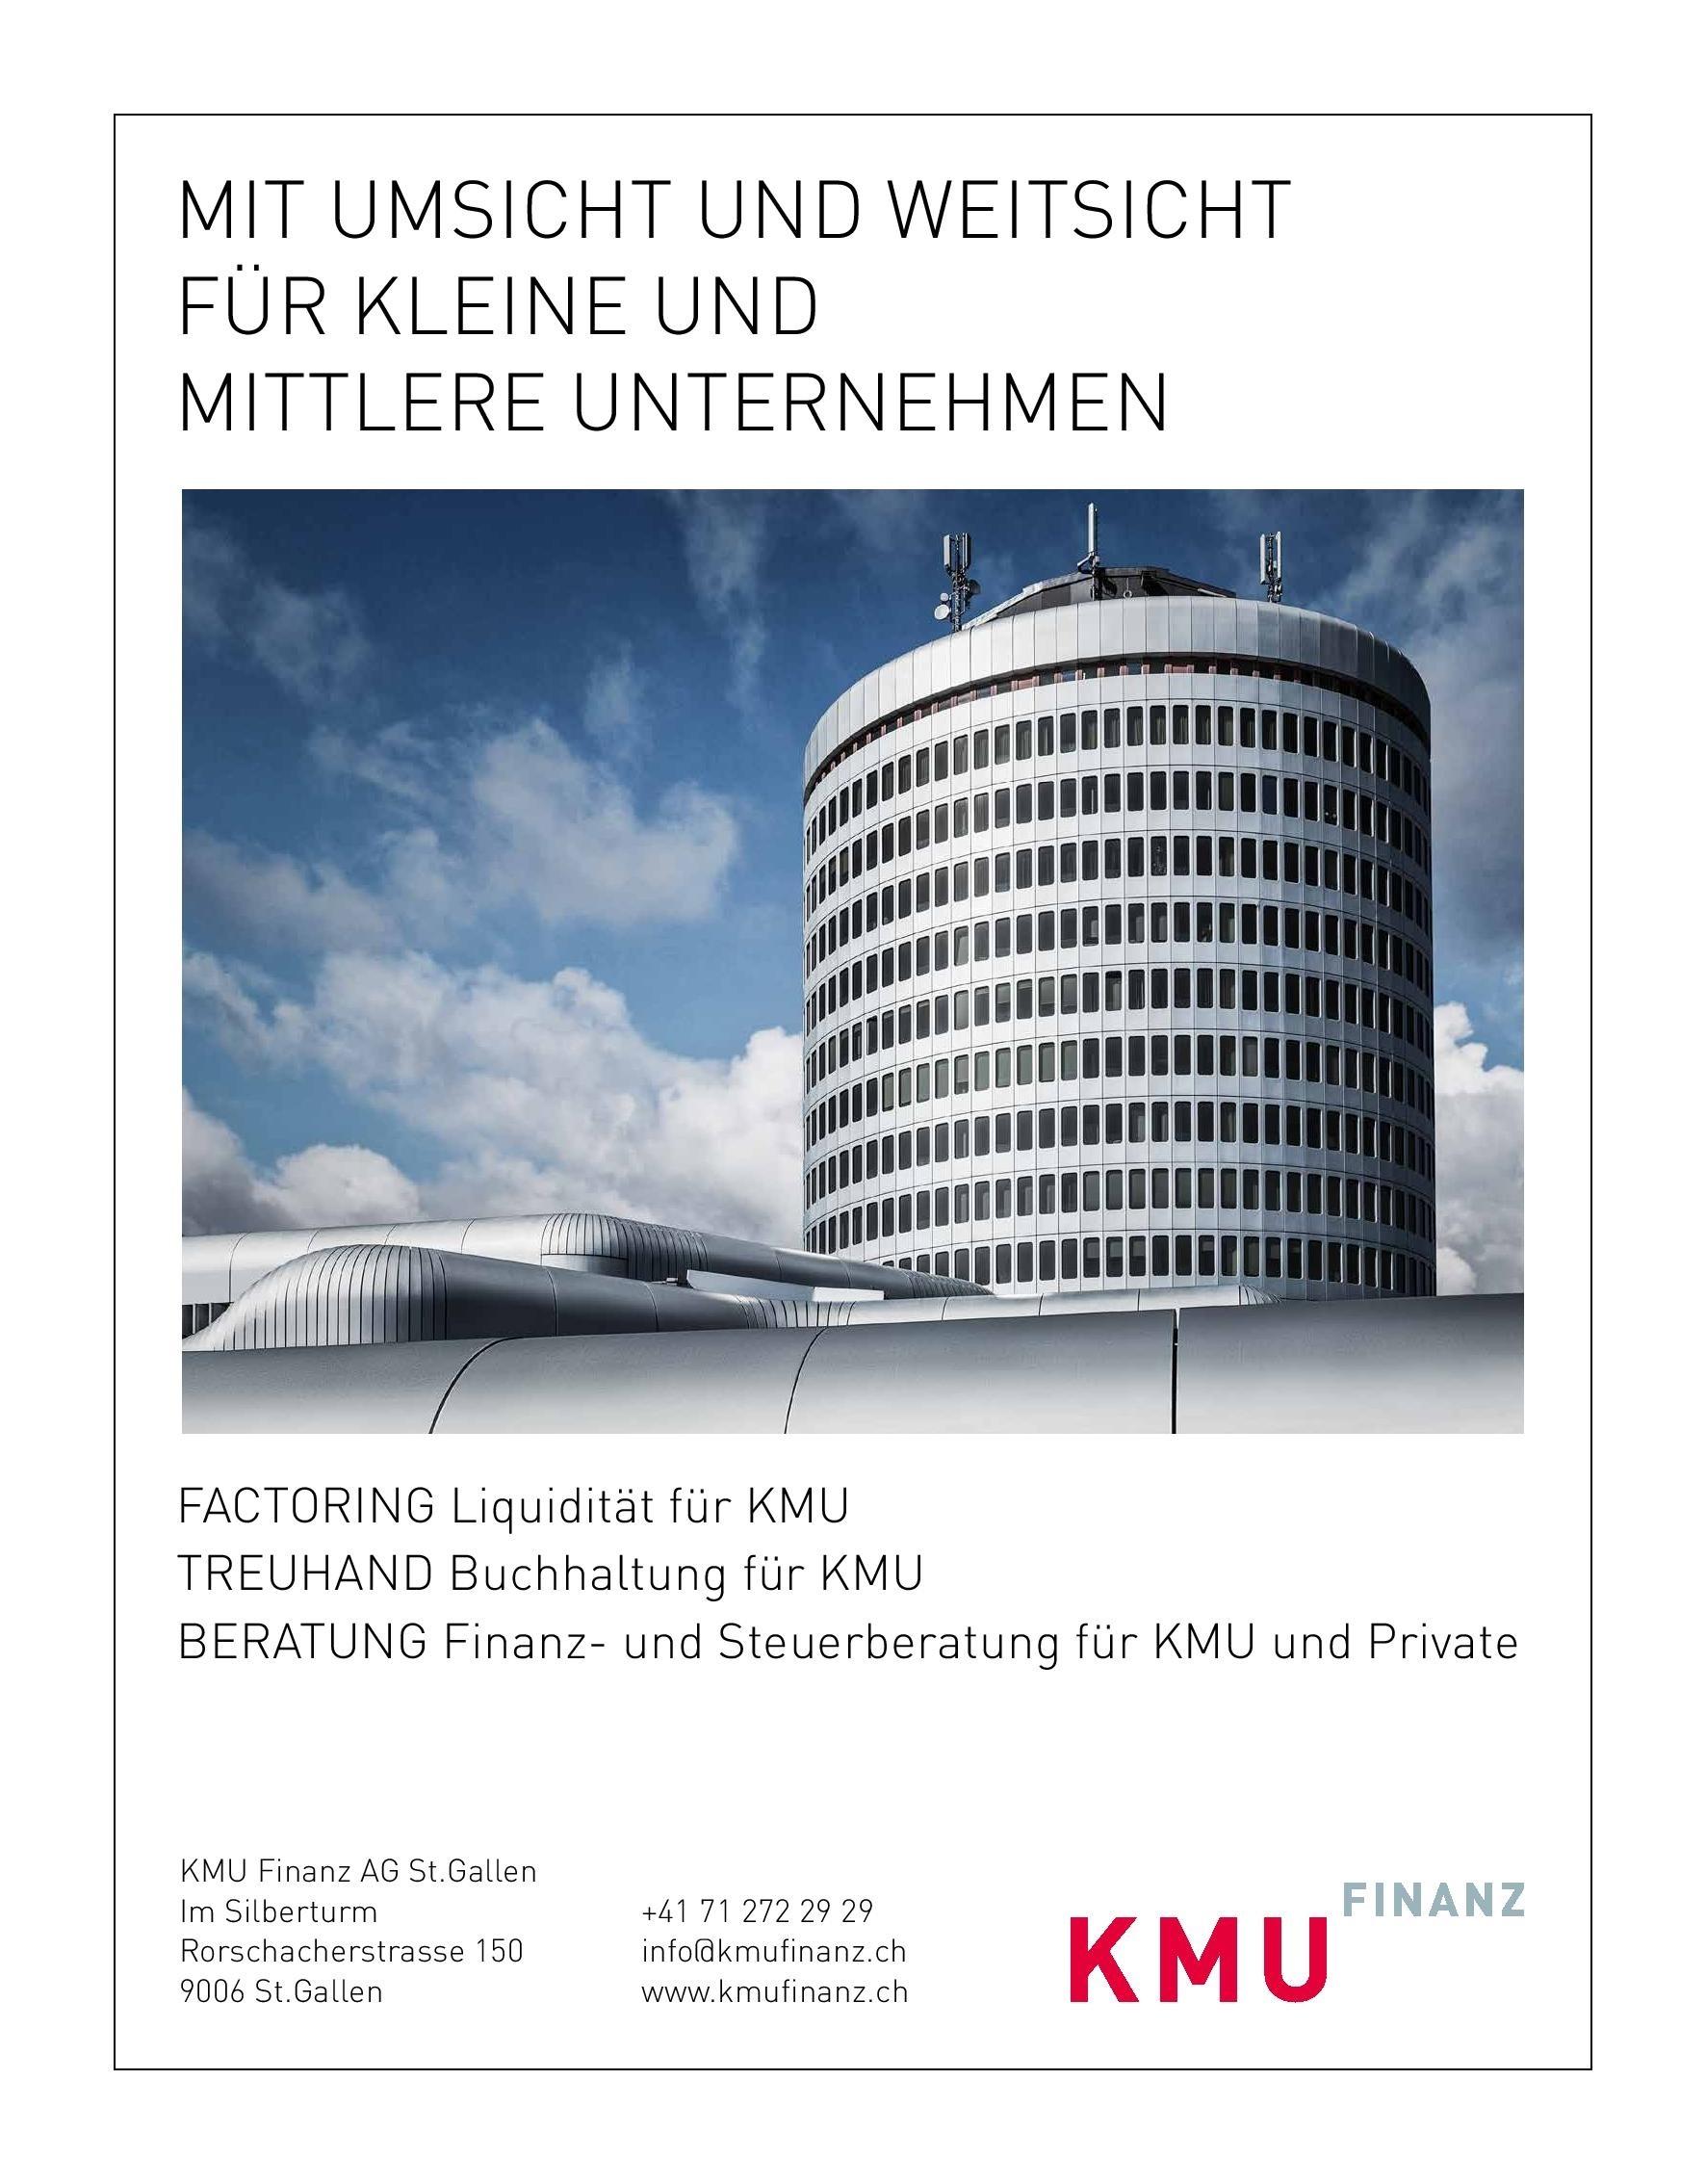 kmu-finanz-ag_stgallen_online-plakat_1772_2268